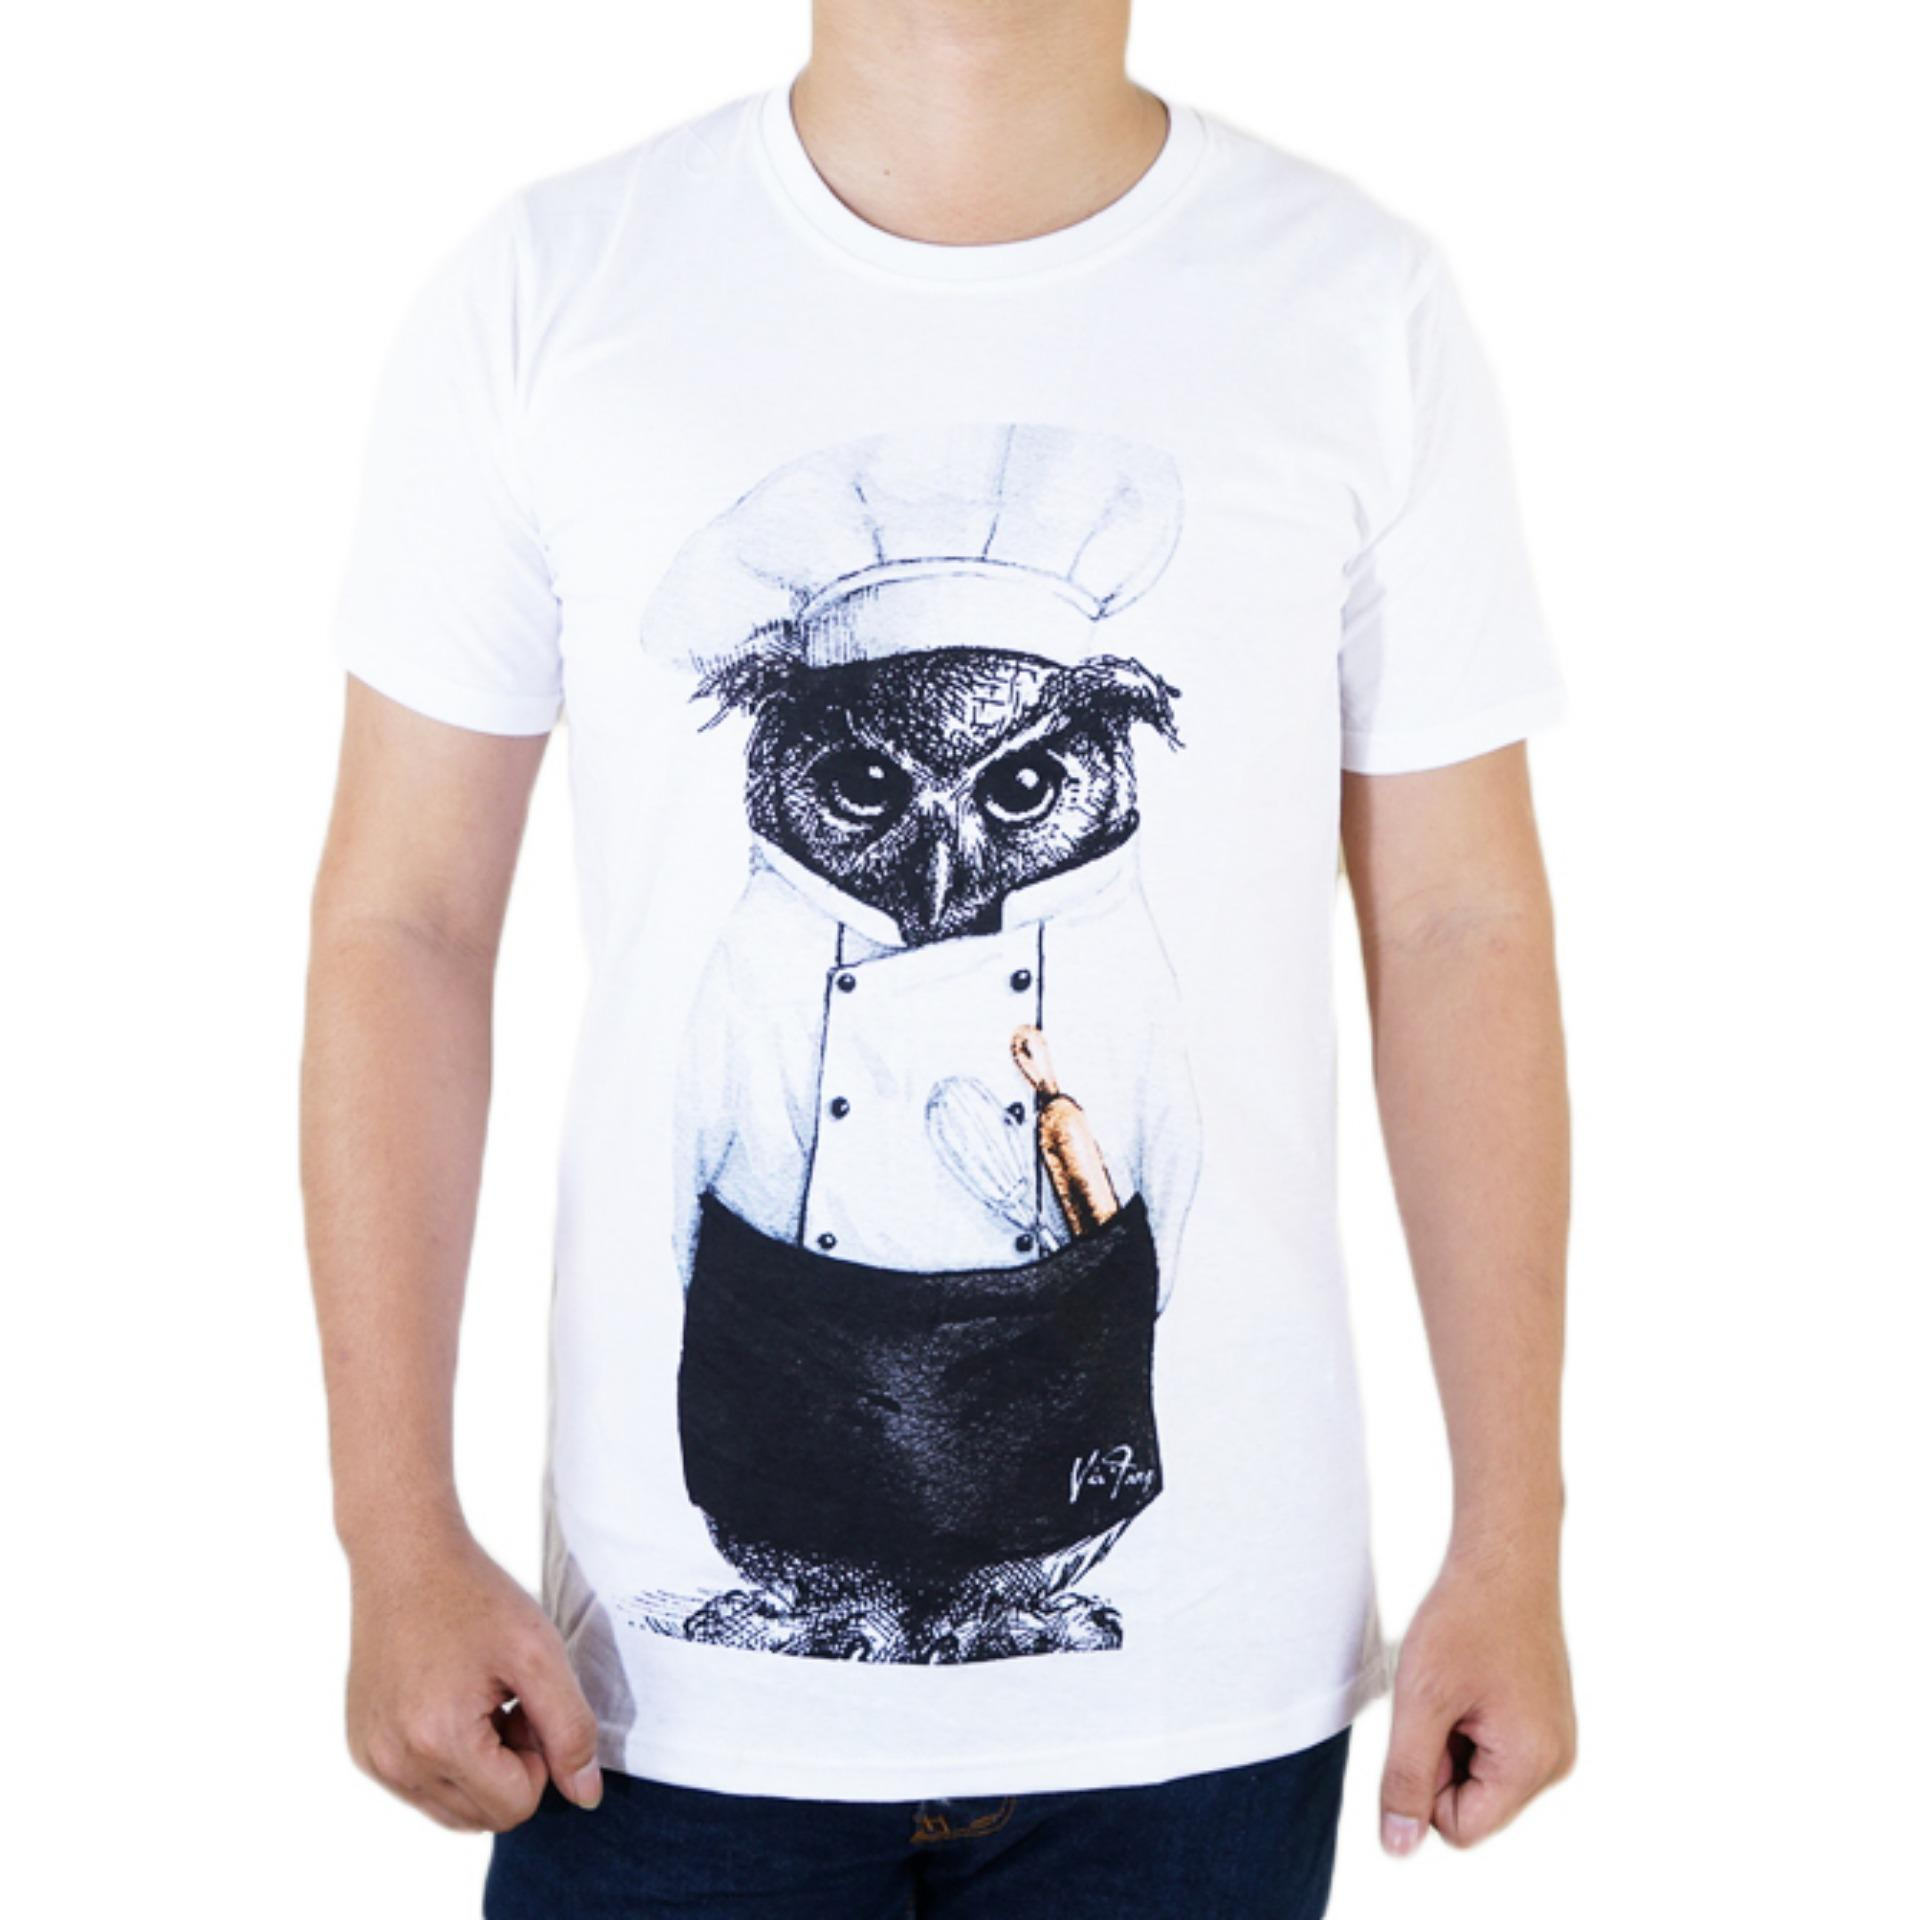 Vanwin - Kaos T-Shirt Distro / kaos Pria / Tshirt Pria / Distro Pria / Baju Pria Premium Owl Chef Koki - Putih